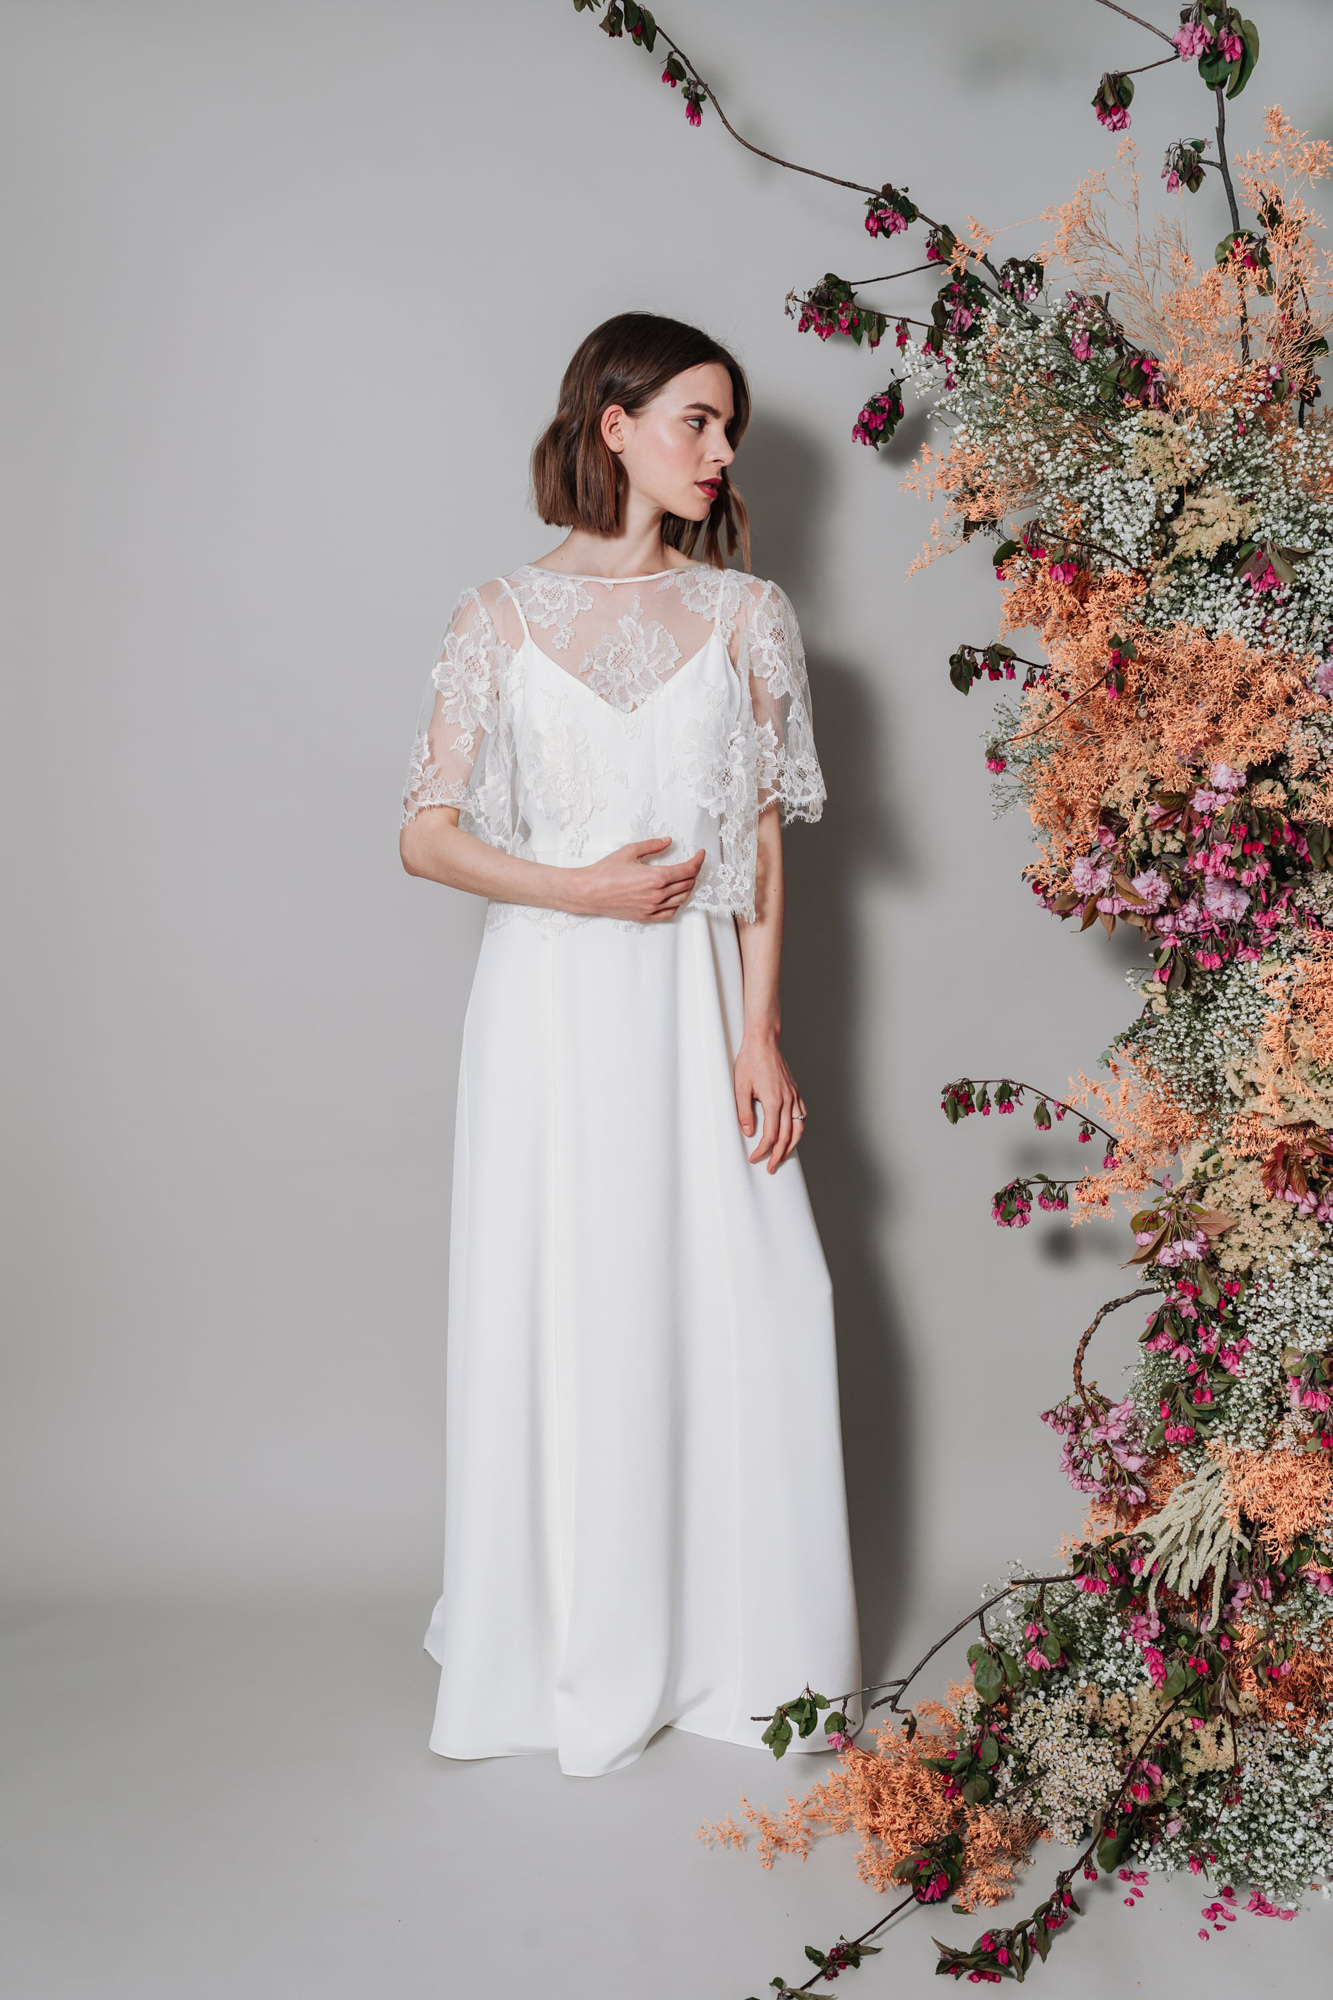 Kate-Beaumont-Sheffield-Rosa-Floral-Lace-Jacket-Snowdrop-Ivory-Matt-Silk-Modern-Wedding-Gown-1.jpg